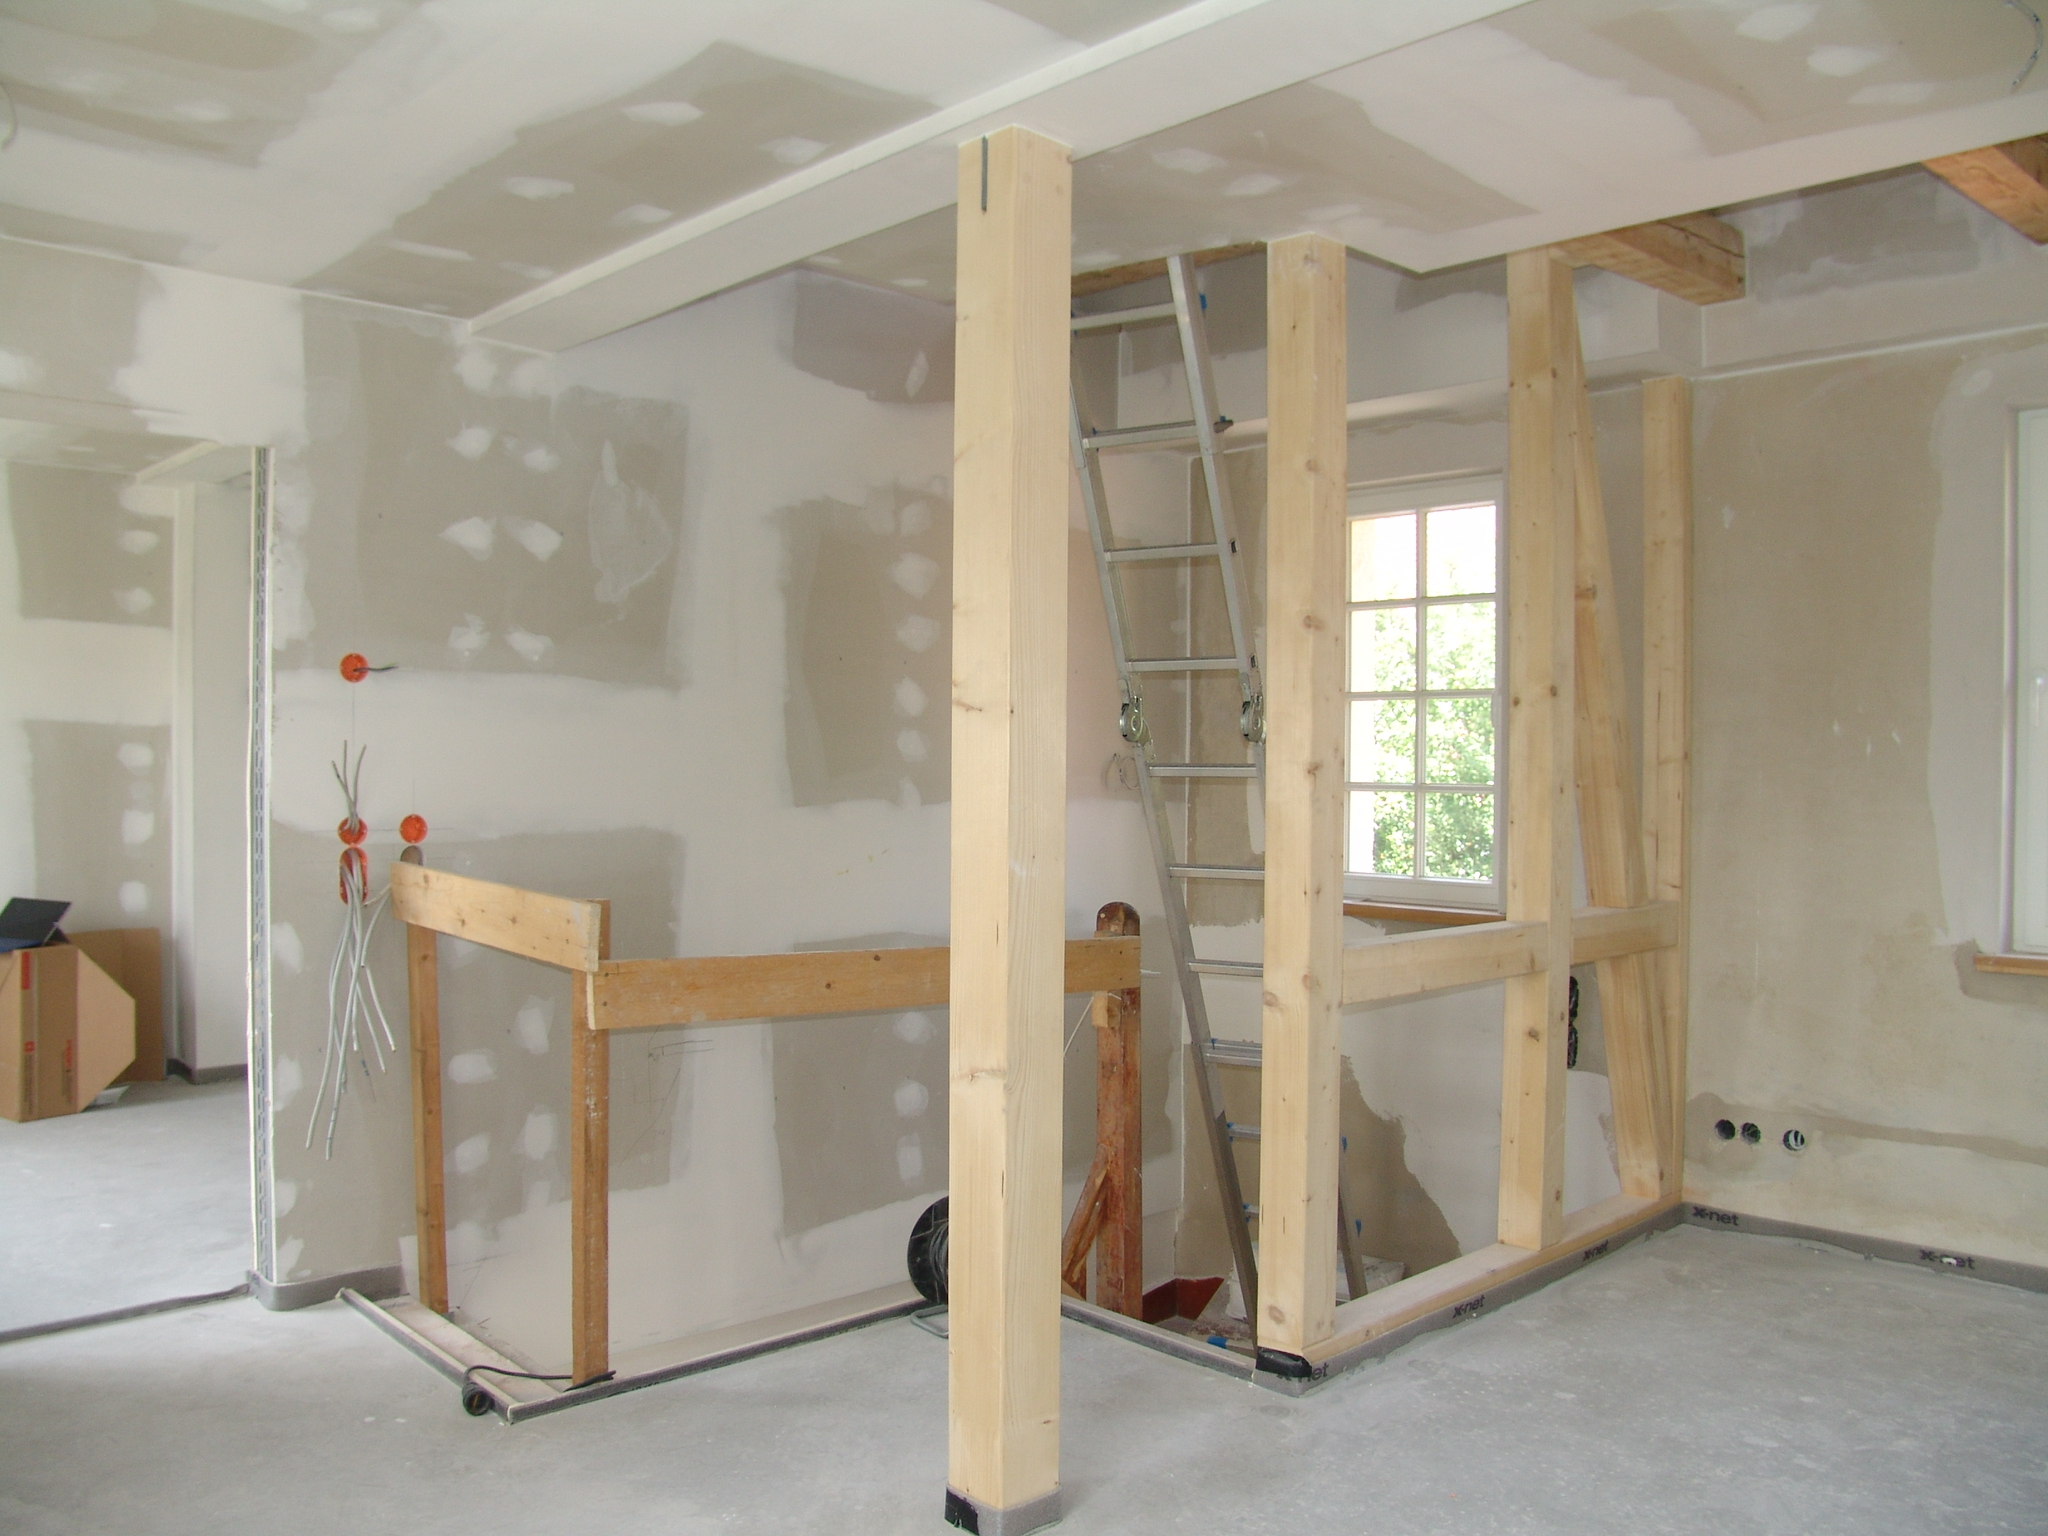 bau+projekt - Planungsbüro Hochbau aktuelles Projekt: Wohnhaus in Hellerau